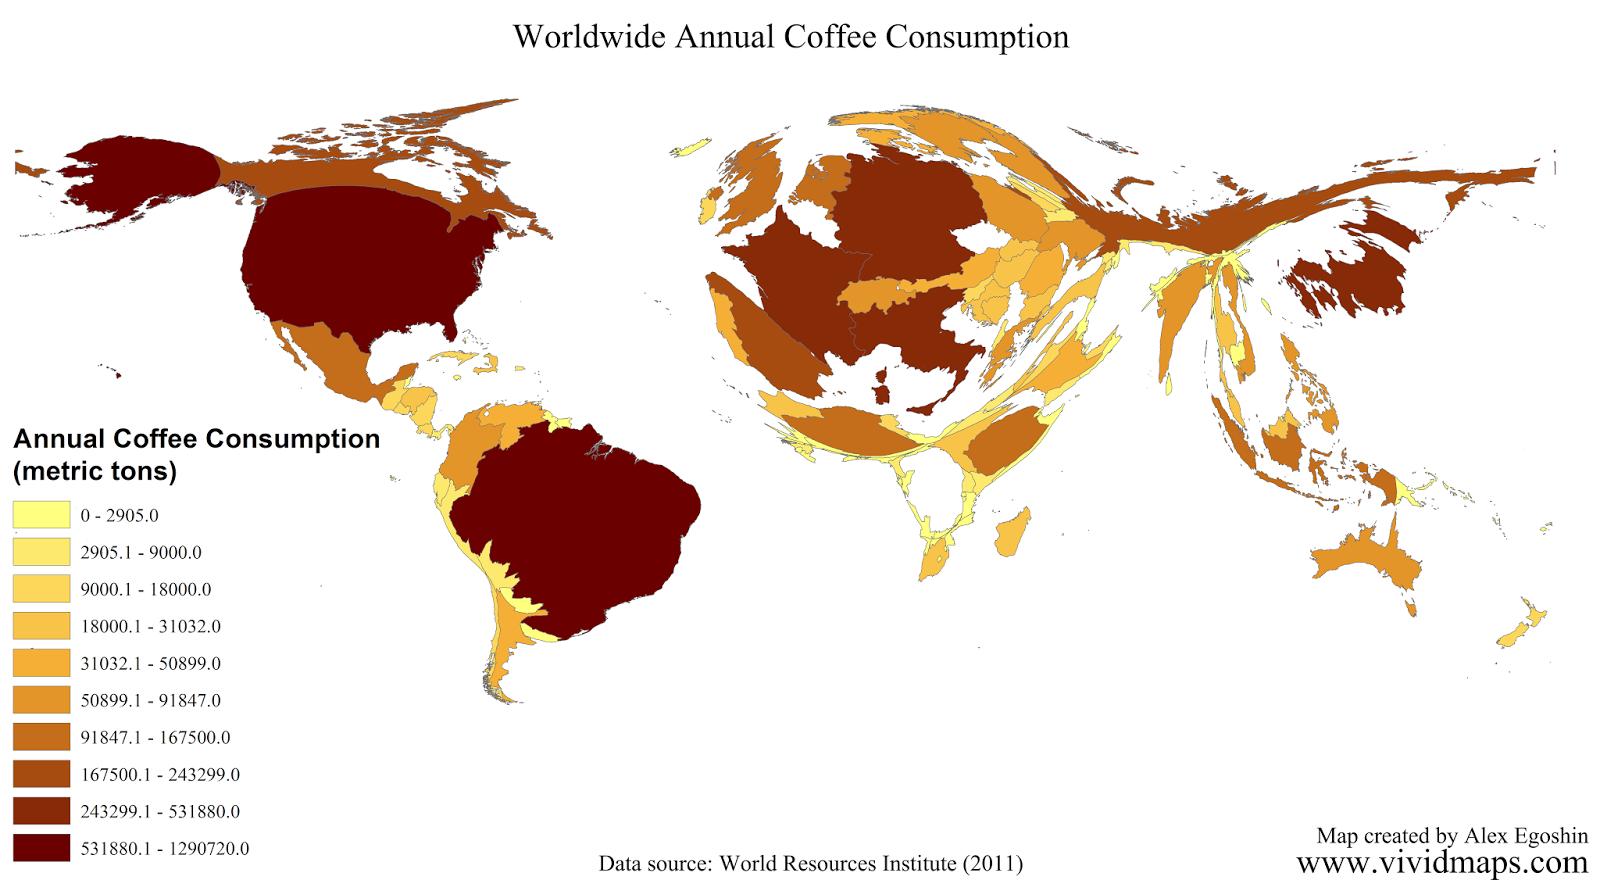 Worldwide annual coffee consumption